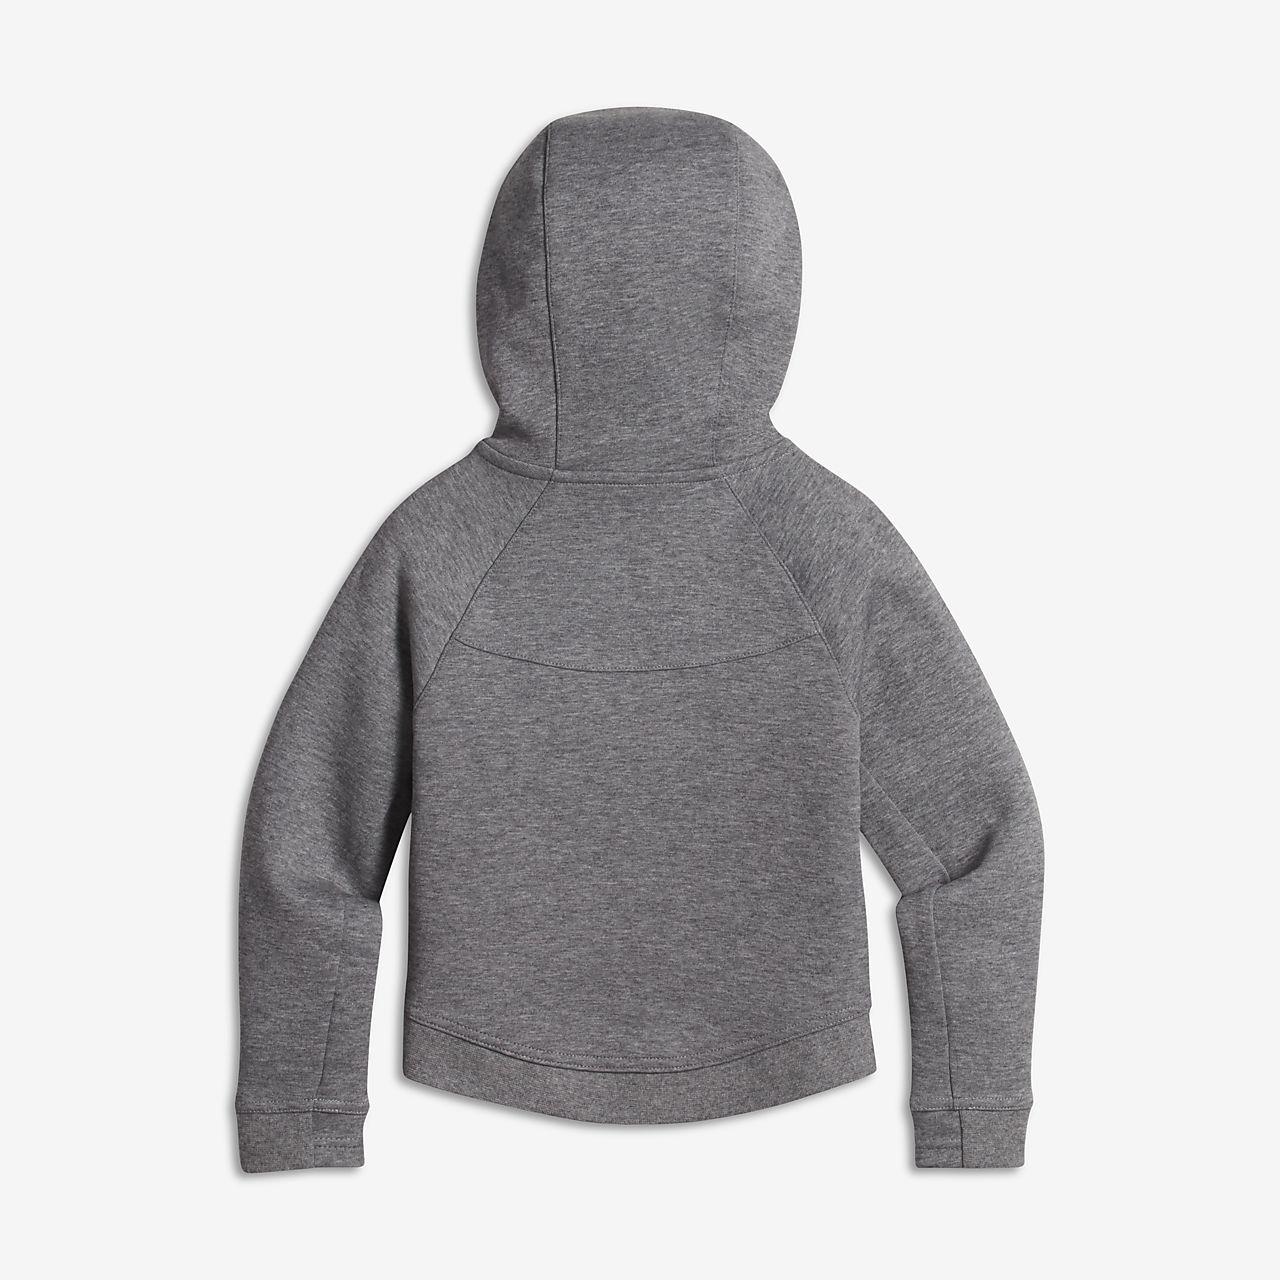 e82f76a0366d Sweat à capuche Nike Sportswear Tech Fleece pour Jeune fille. Nike ...